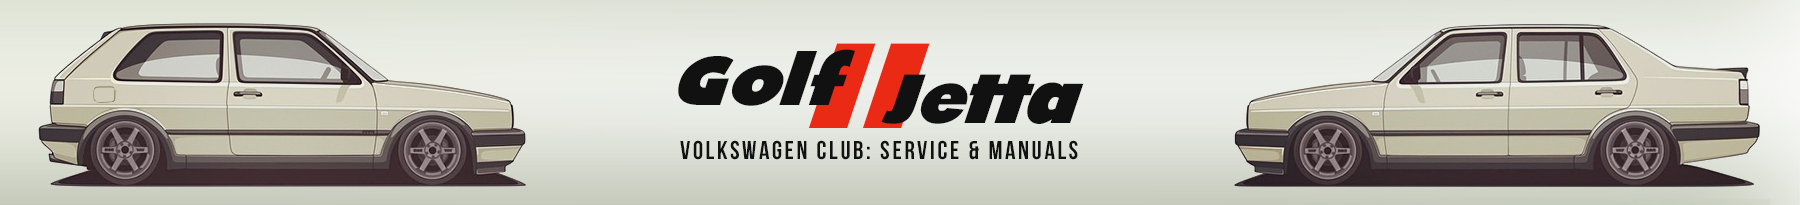 Golf2Jetta Club. Гольф 2, Джетта 2 Клуб, Форум